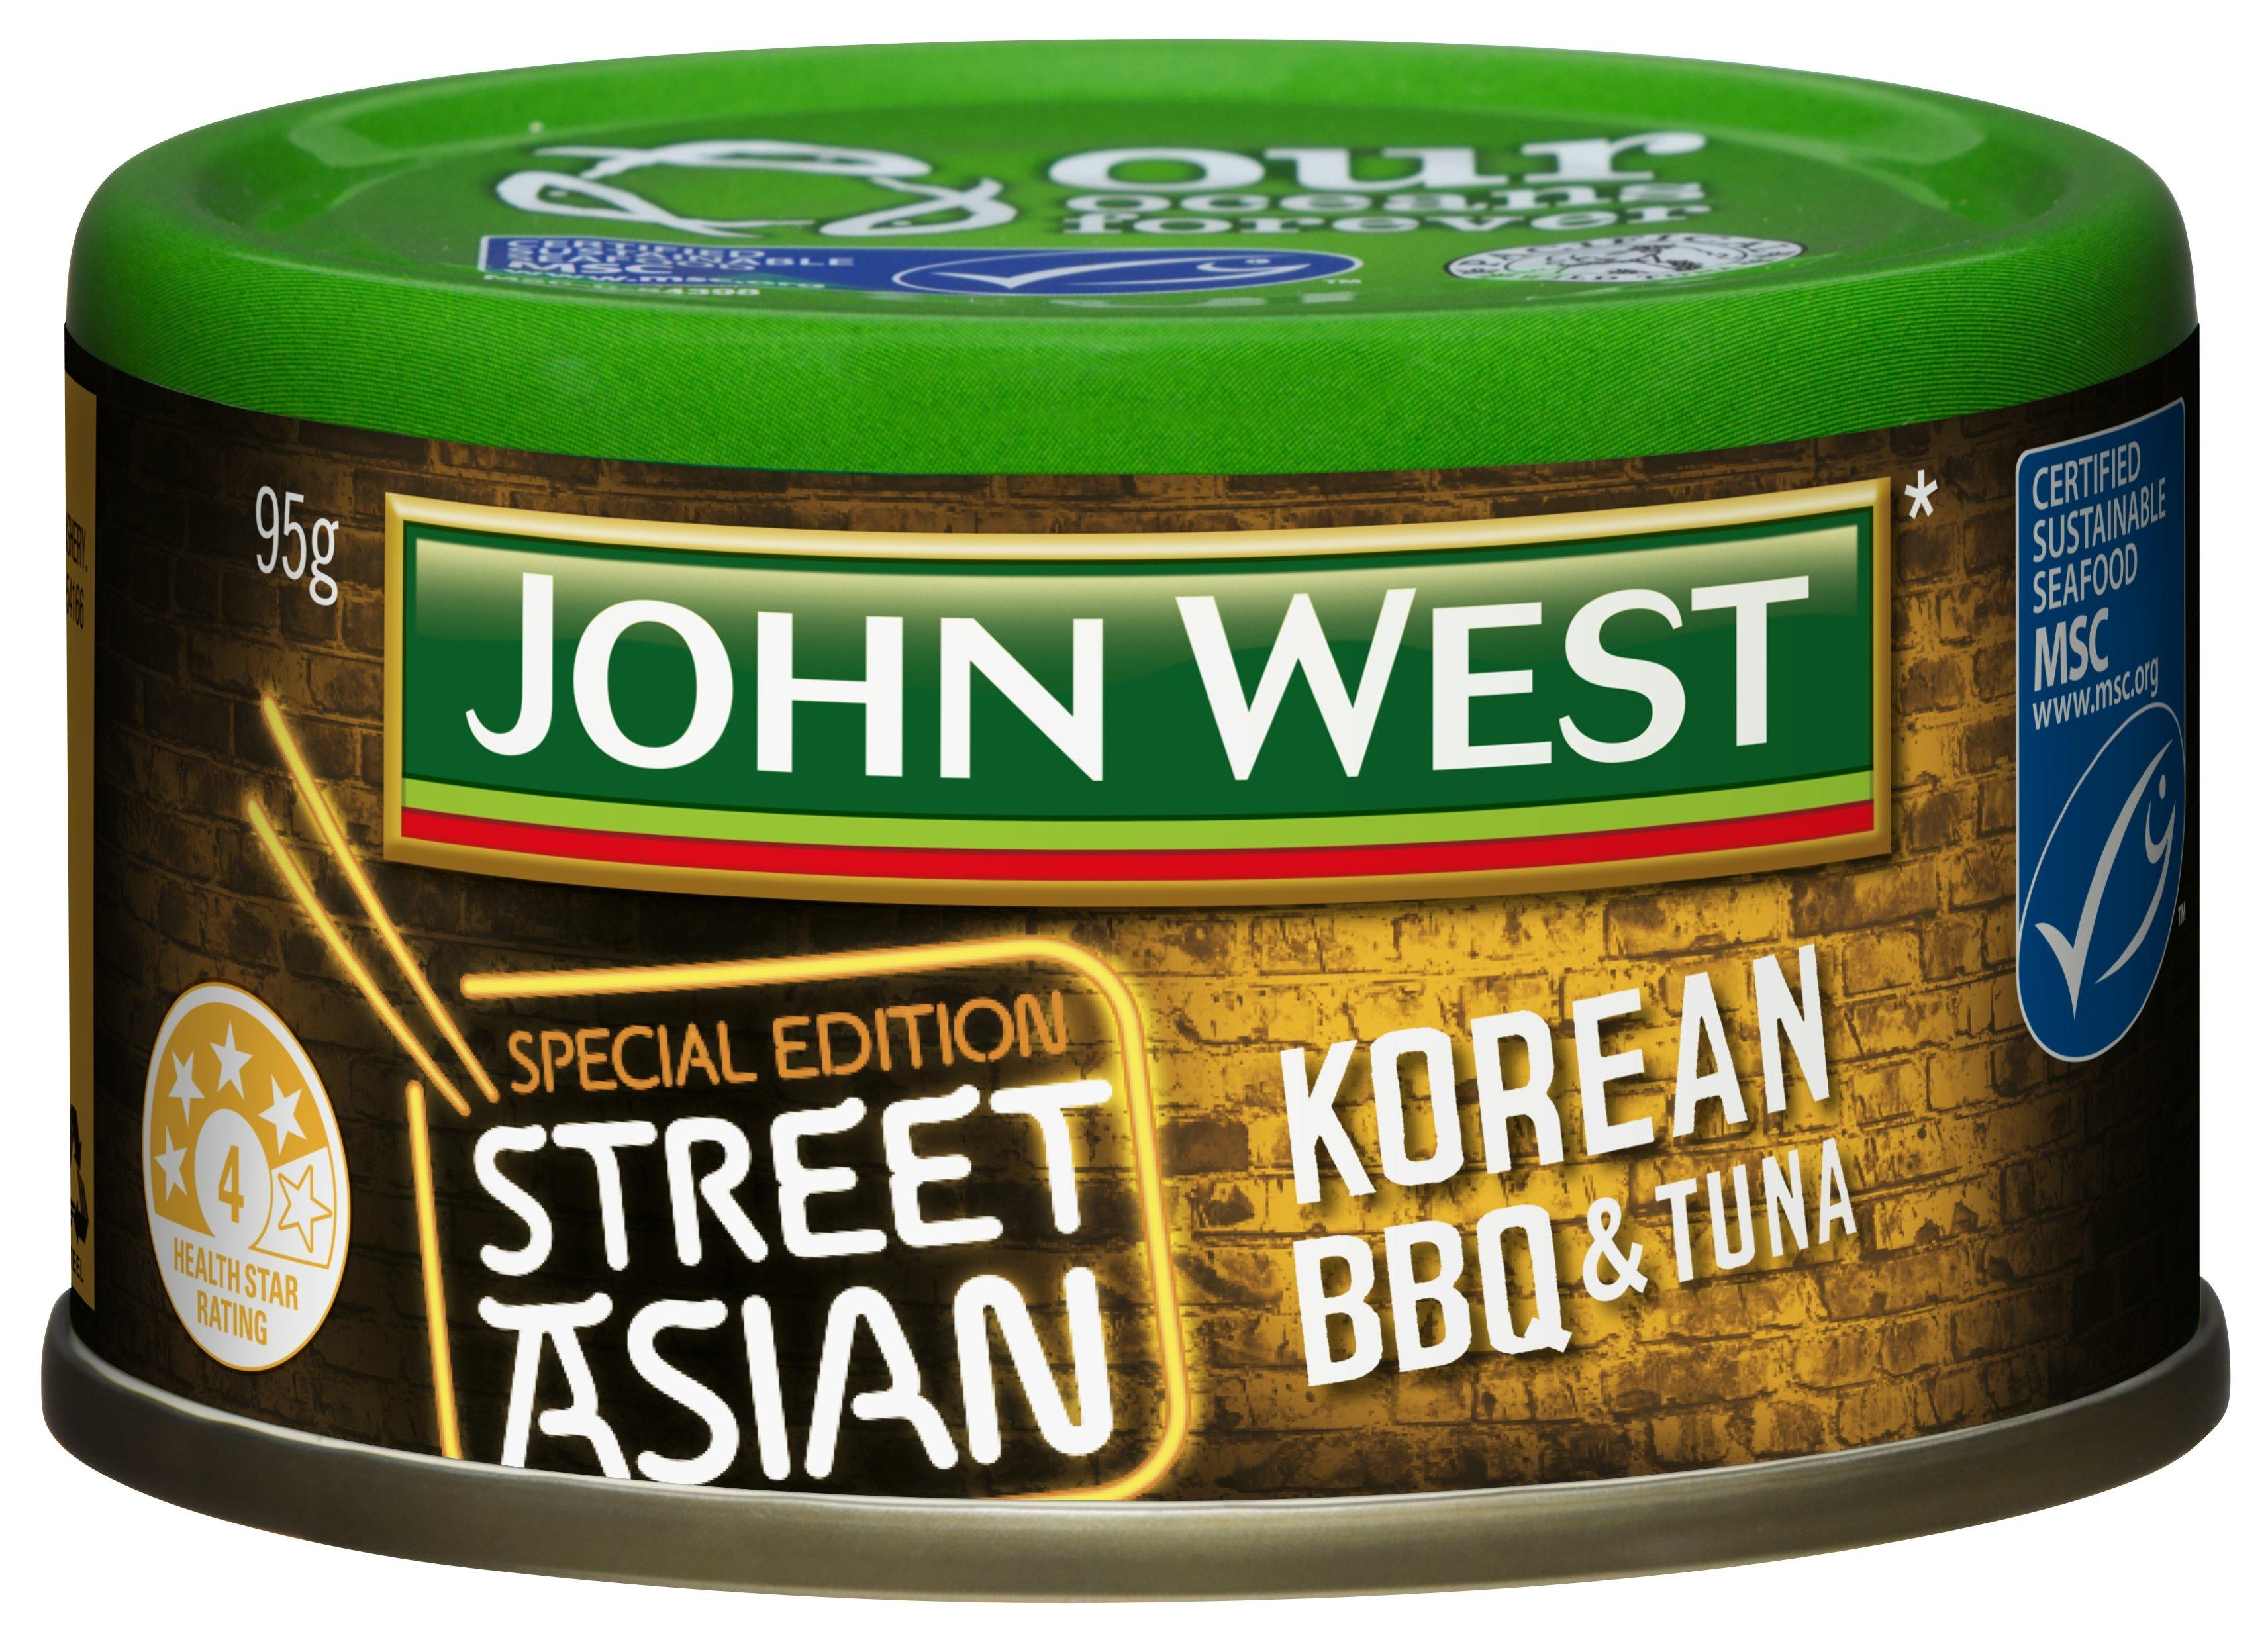 Tuna Street Asian Korean BBQ 95g